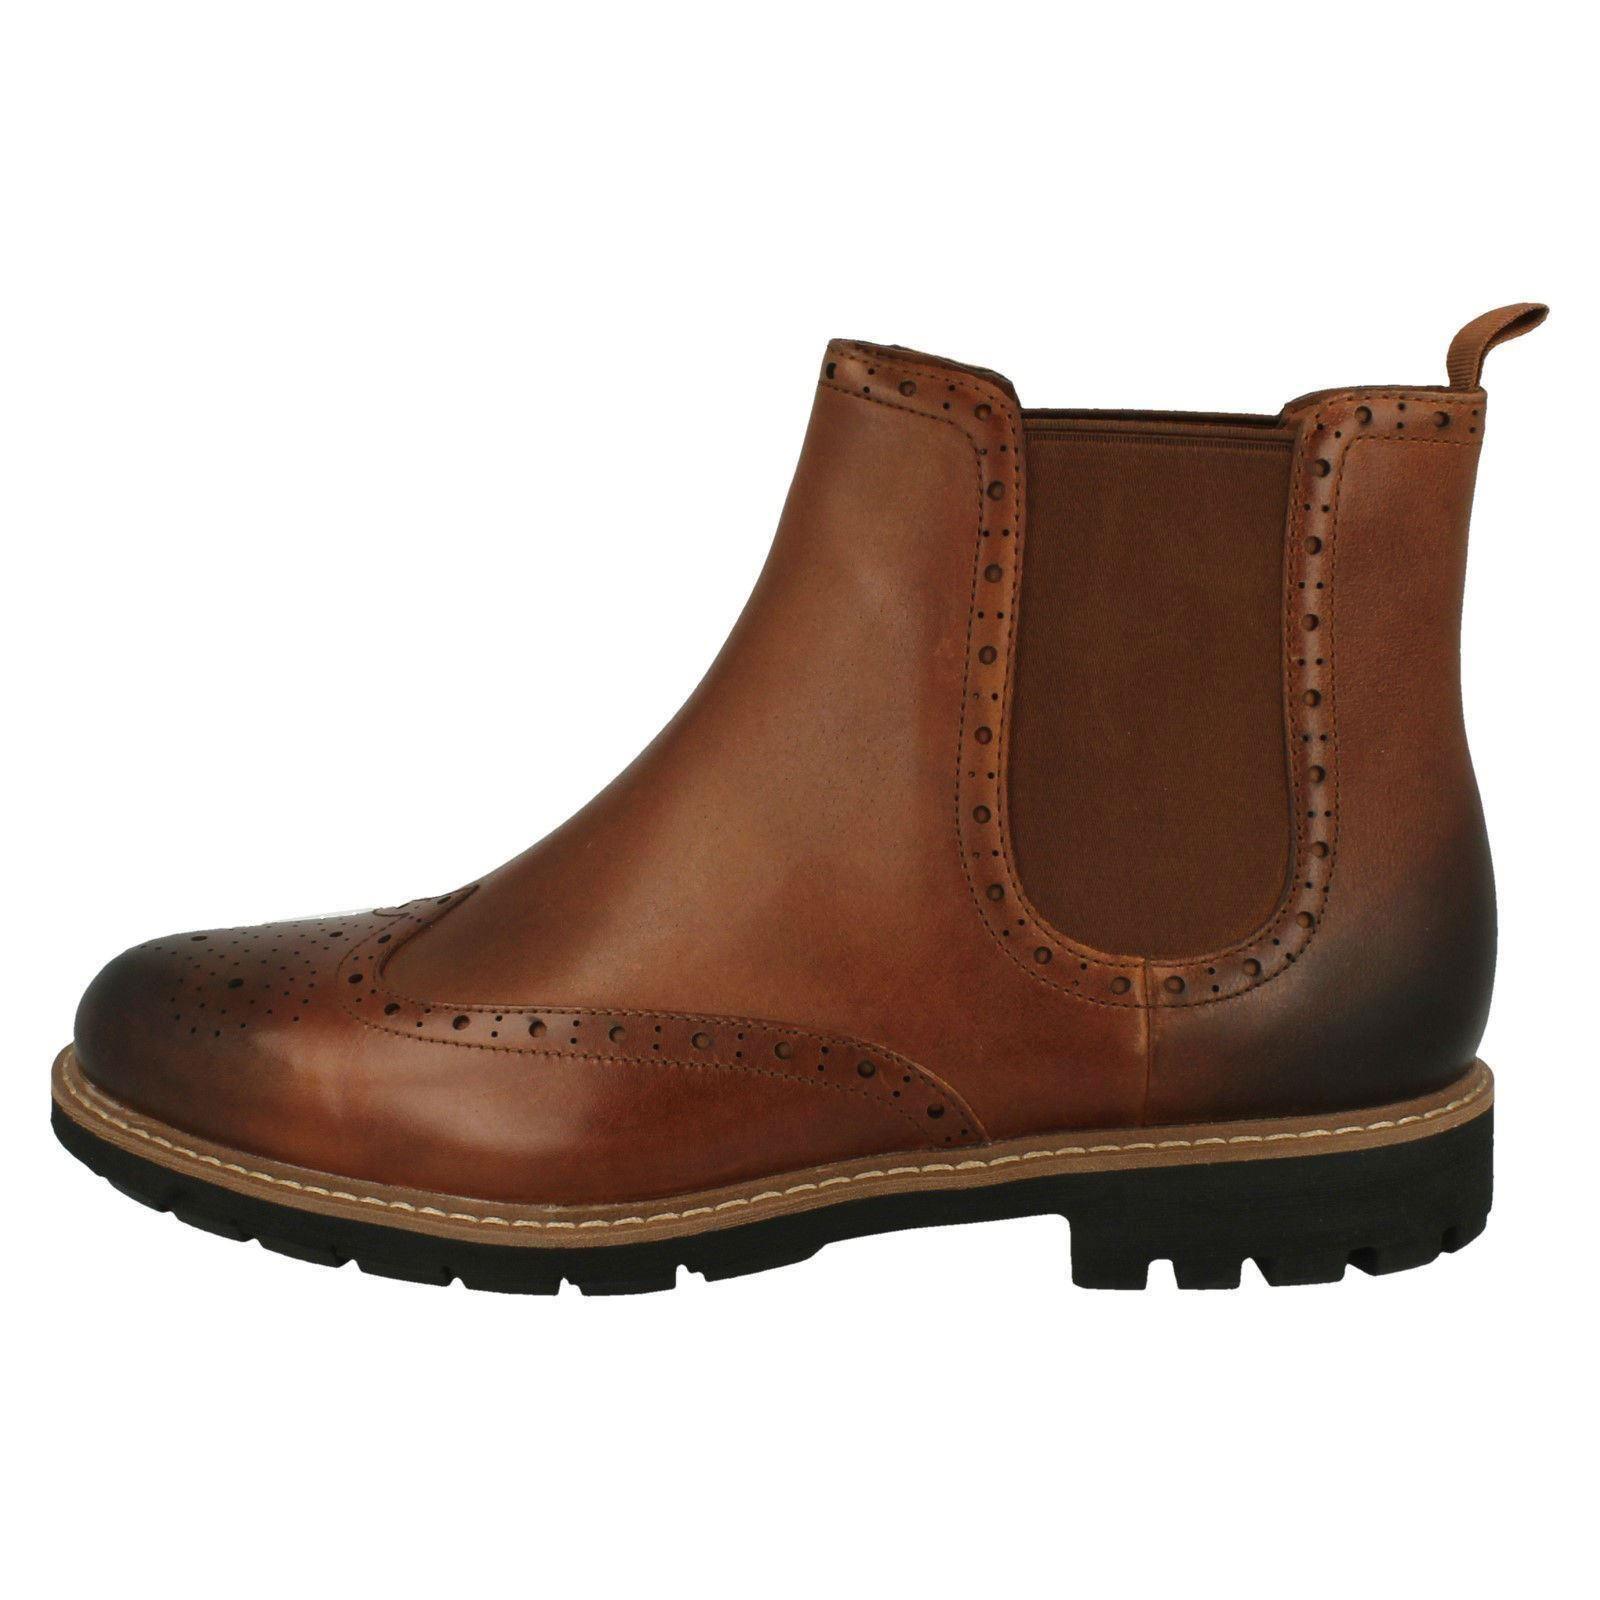 Elegante Gusset Top' Chelsea Boots marrone 'batcombe Tan Dark Mens Clarks gqwPx5